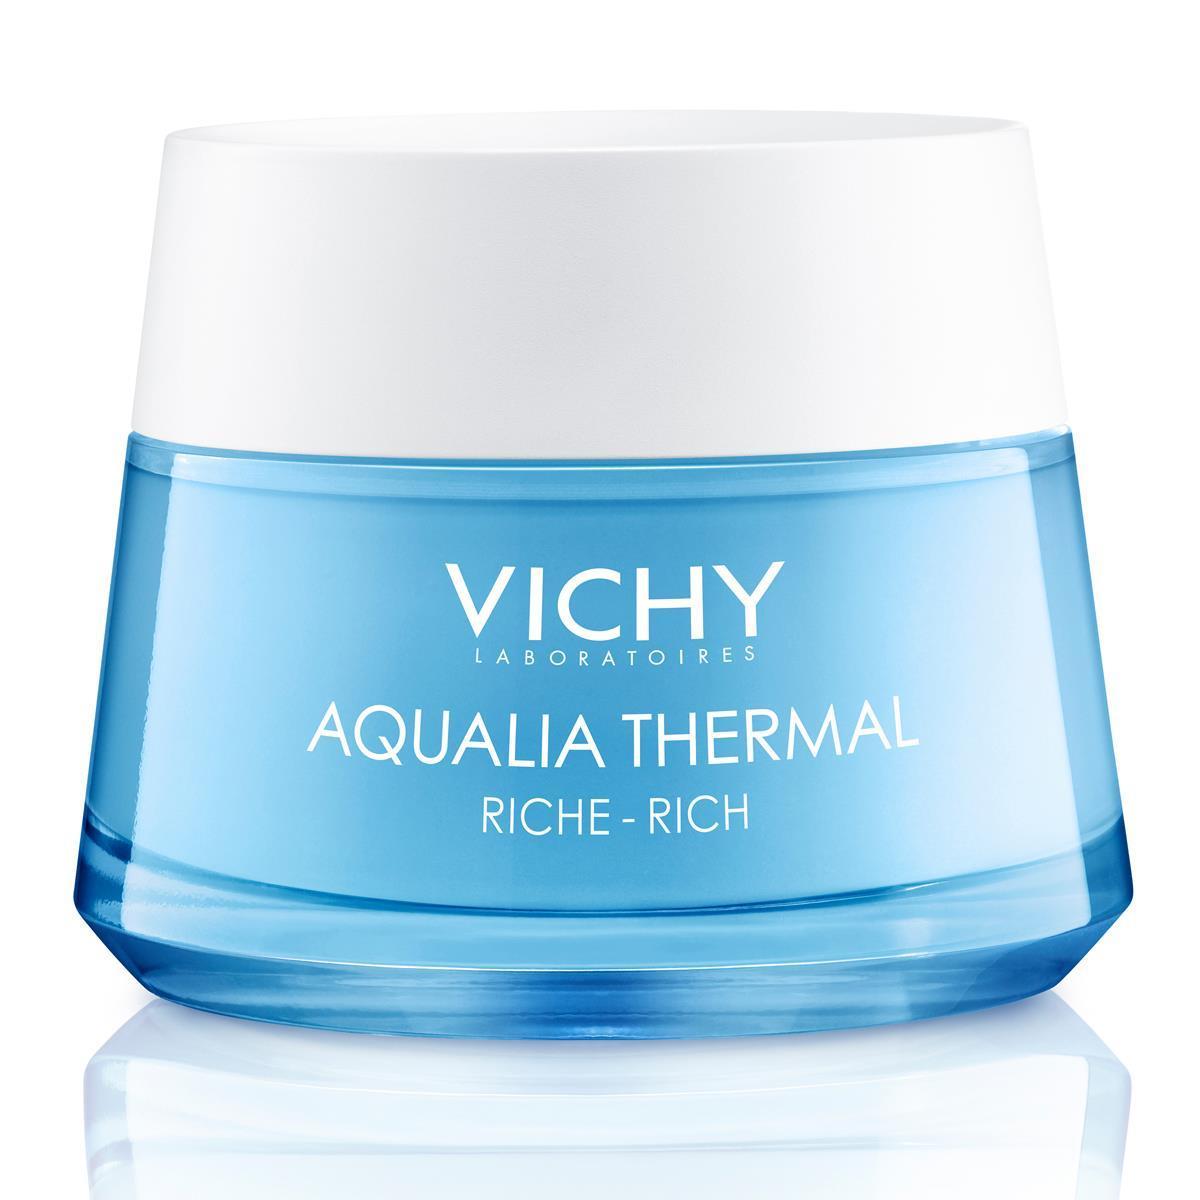 Aqualia Crema Rica 50Ml